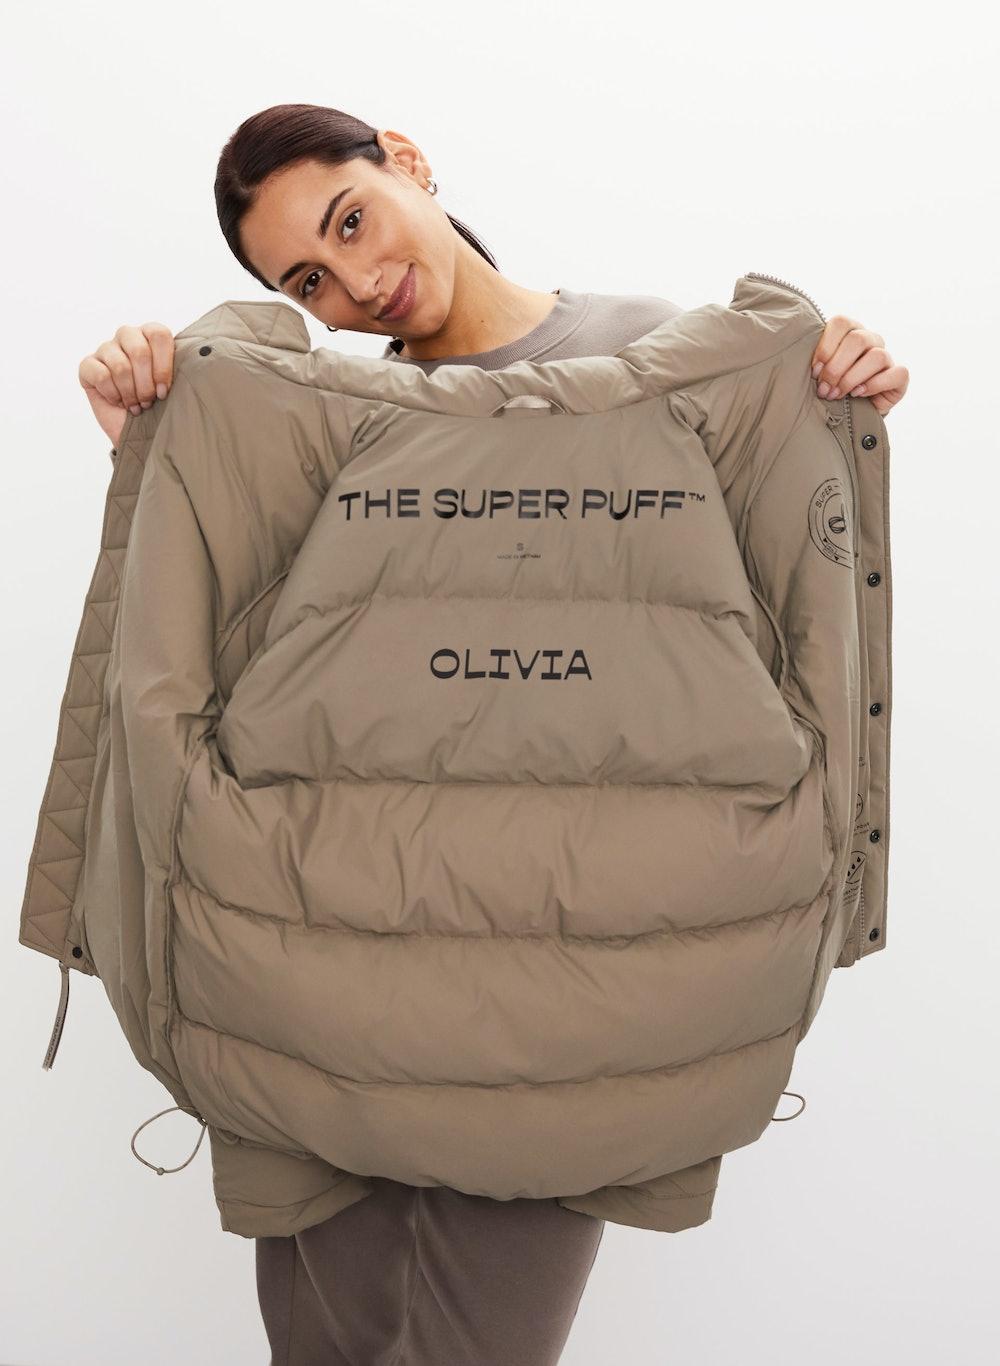 The Super Puff™ Personalized